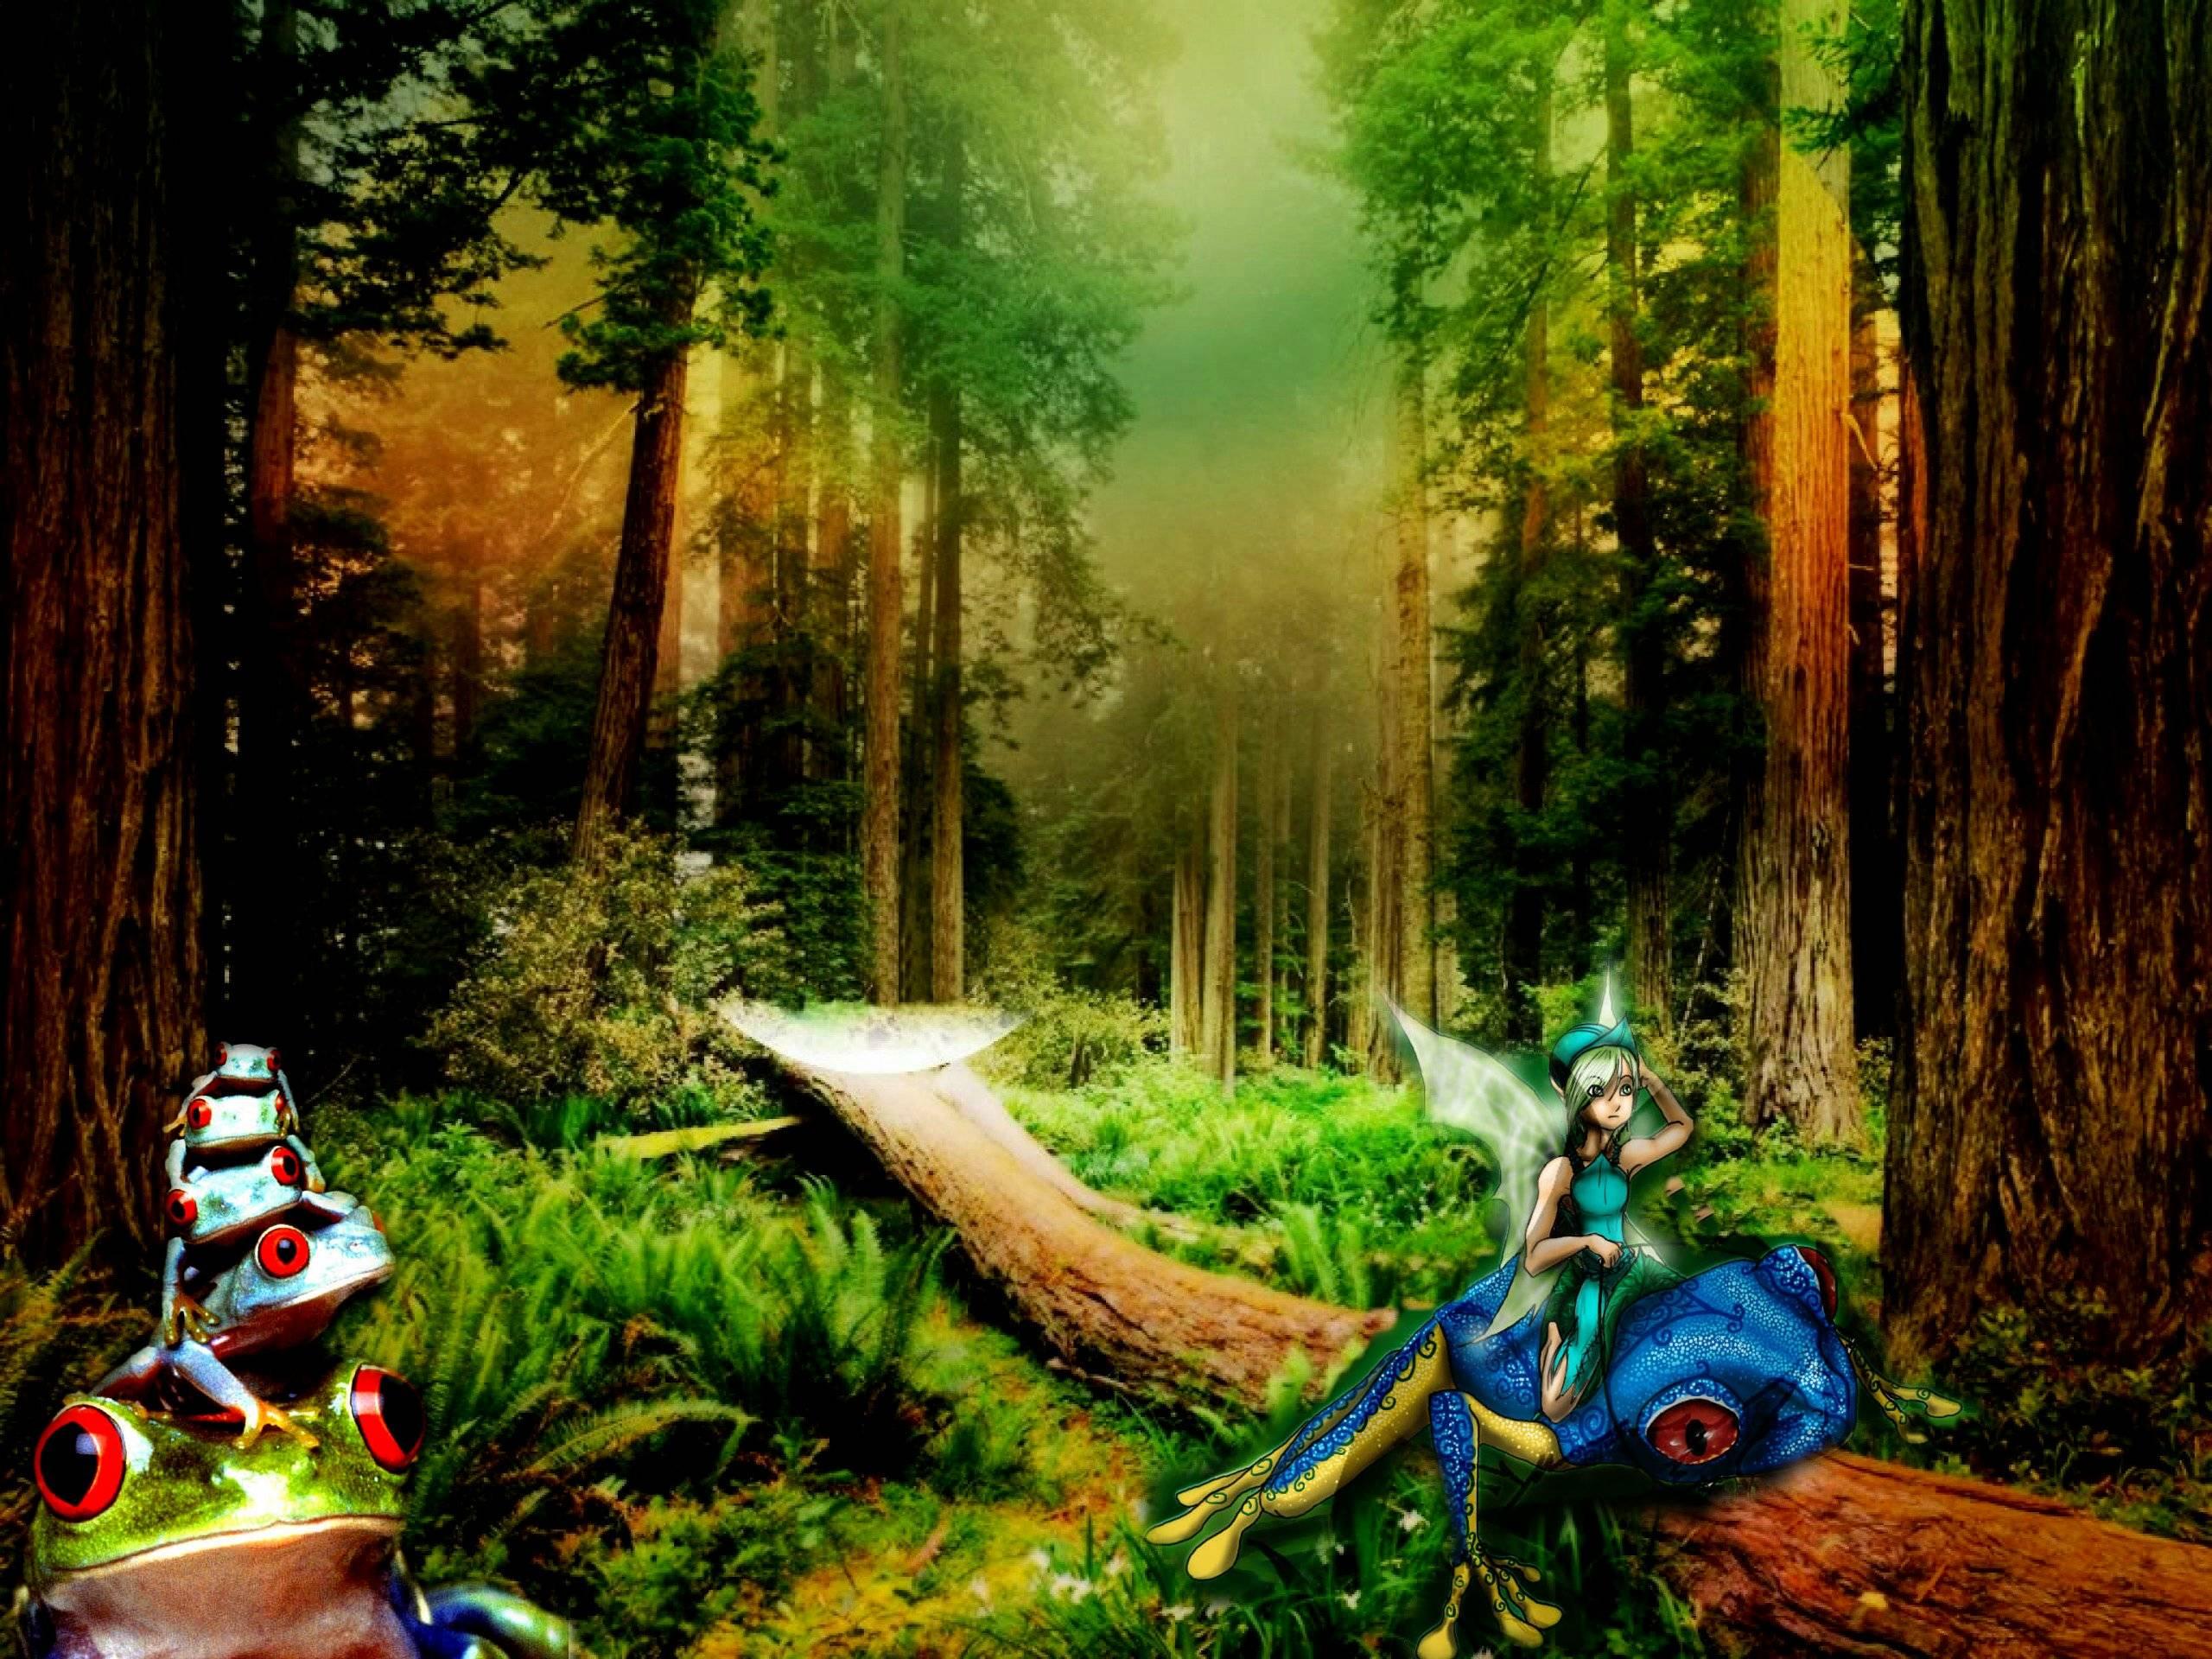 enchanted forest wallpapers wallpapersafari